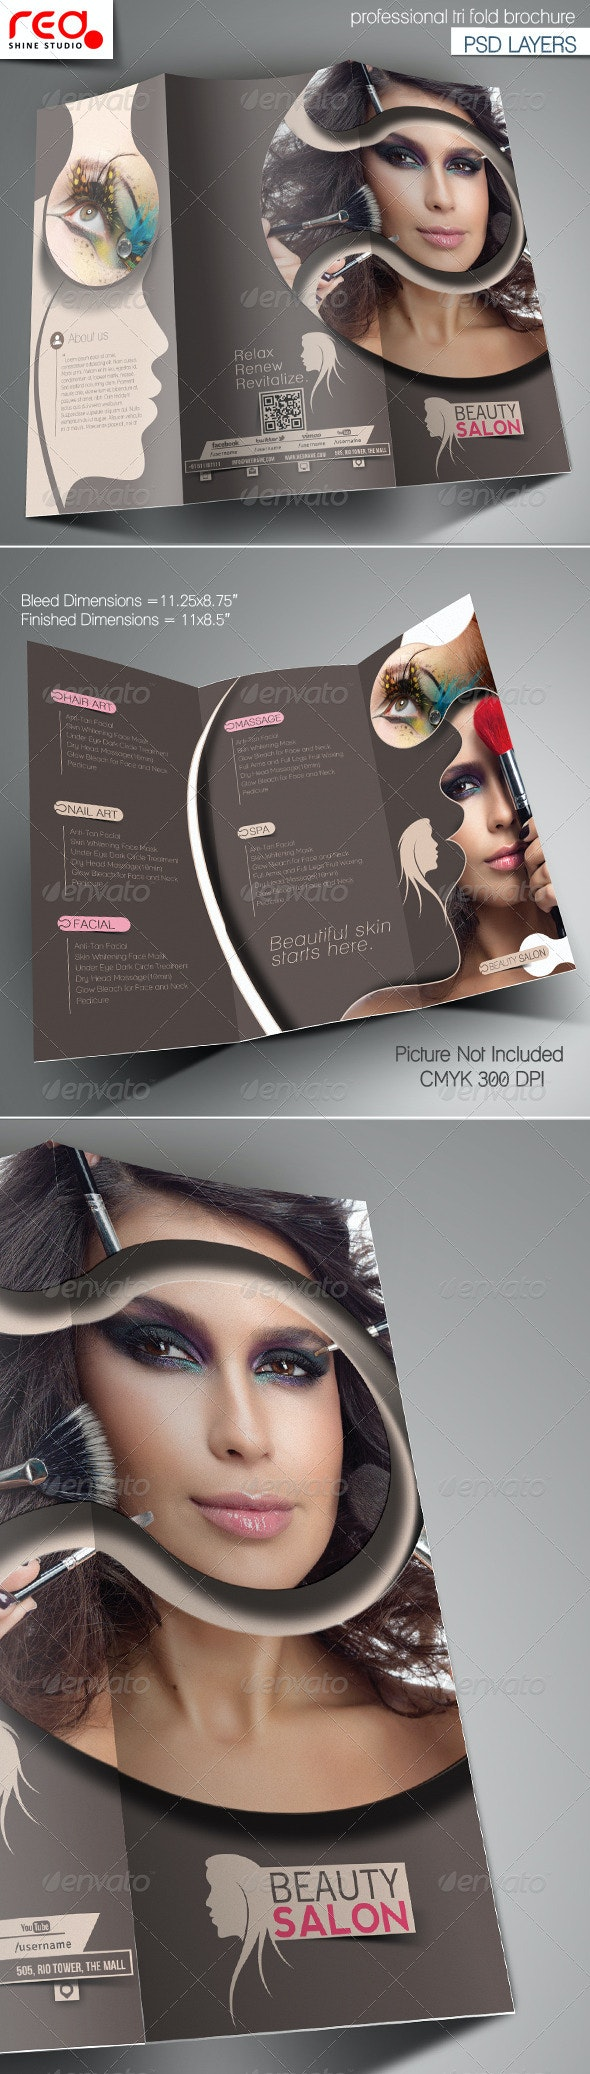 Beauty Salon Promotion Trifold Brochure Template  - Corporate Brochures